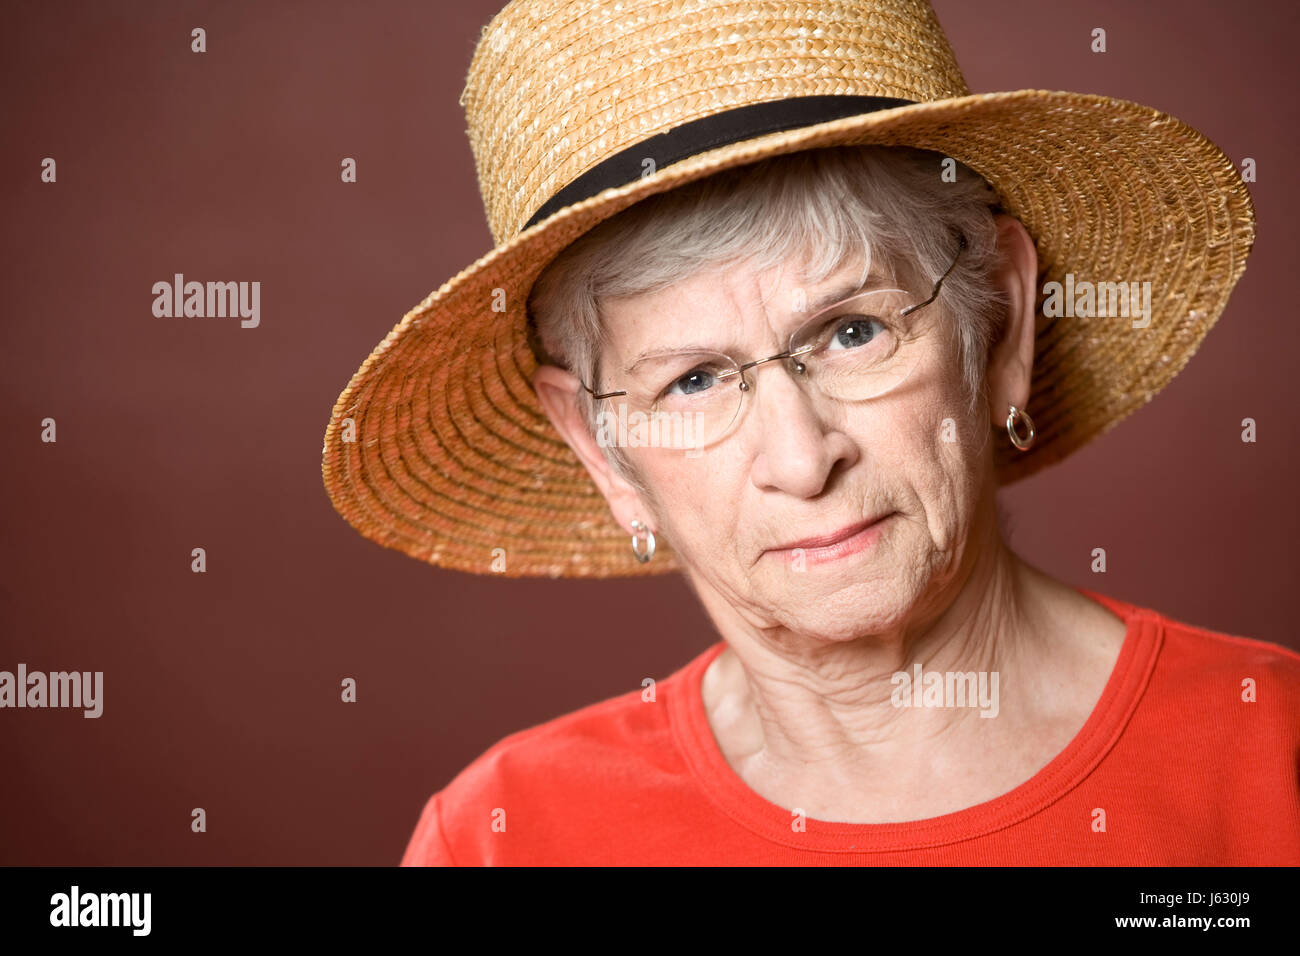 lady female hat eccentric old elderly grey gray elder woman macro close-up Stock Photo